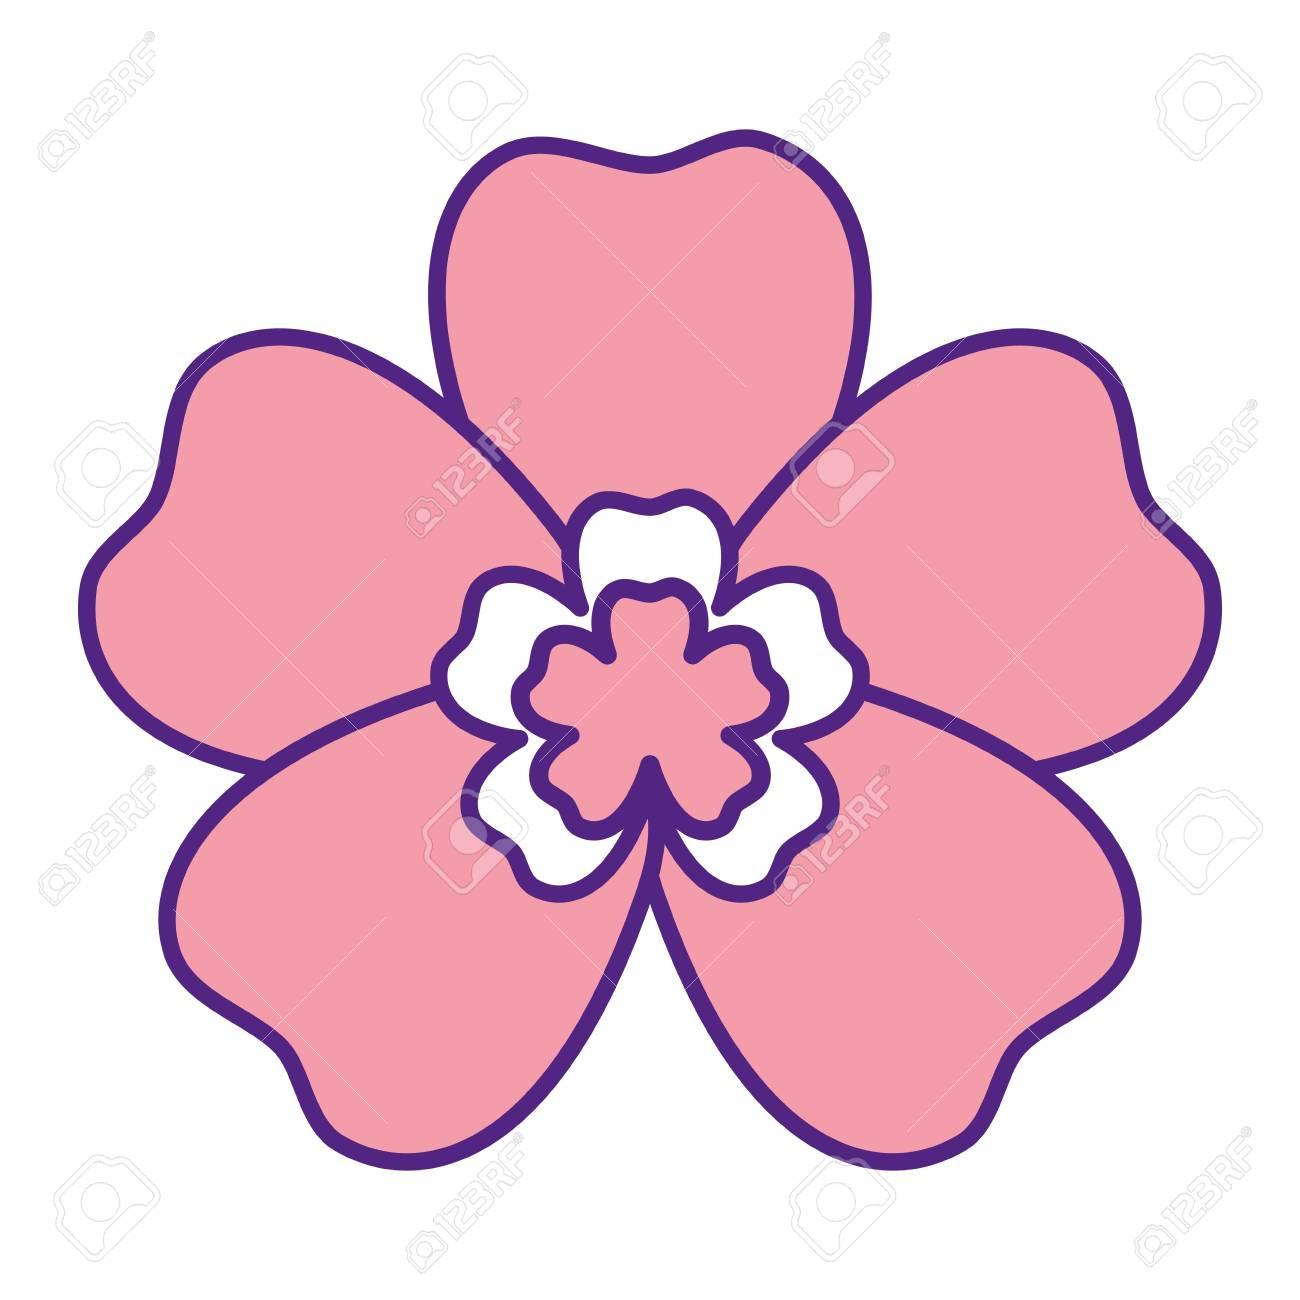 Kawaii Cute Flower Ornament Cartoon Vector Illustration Pink